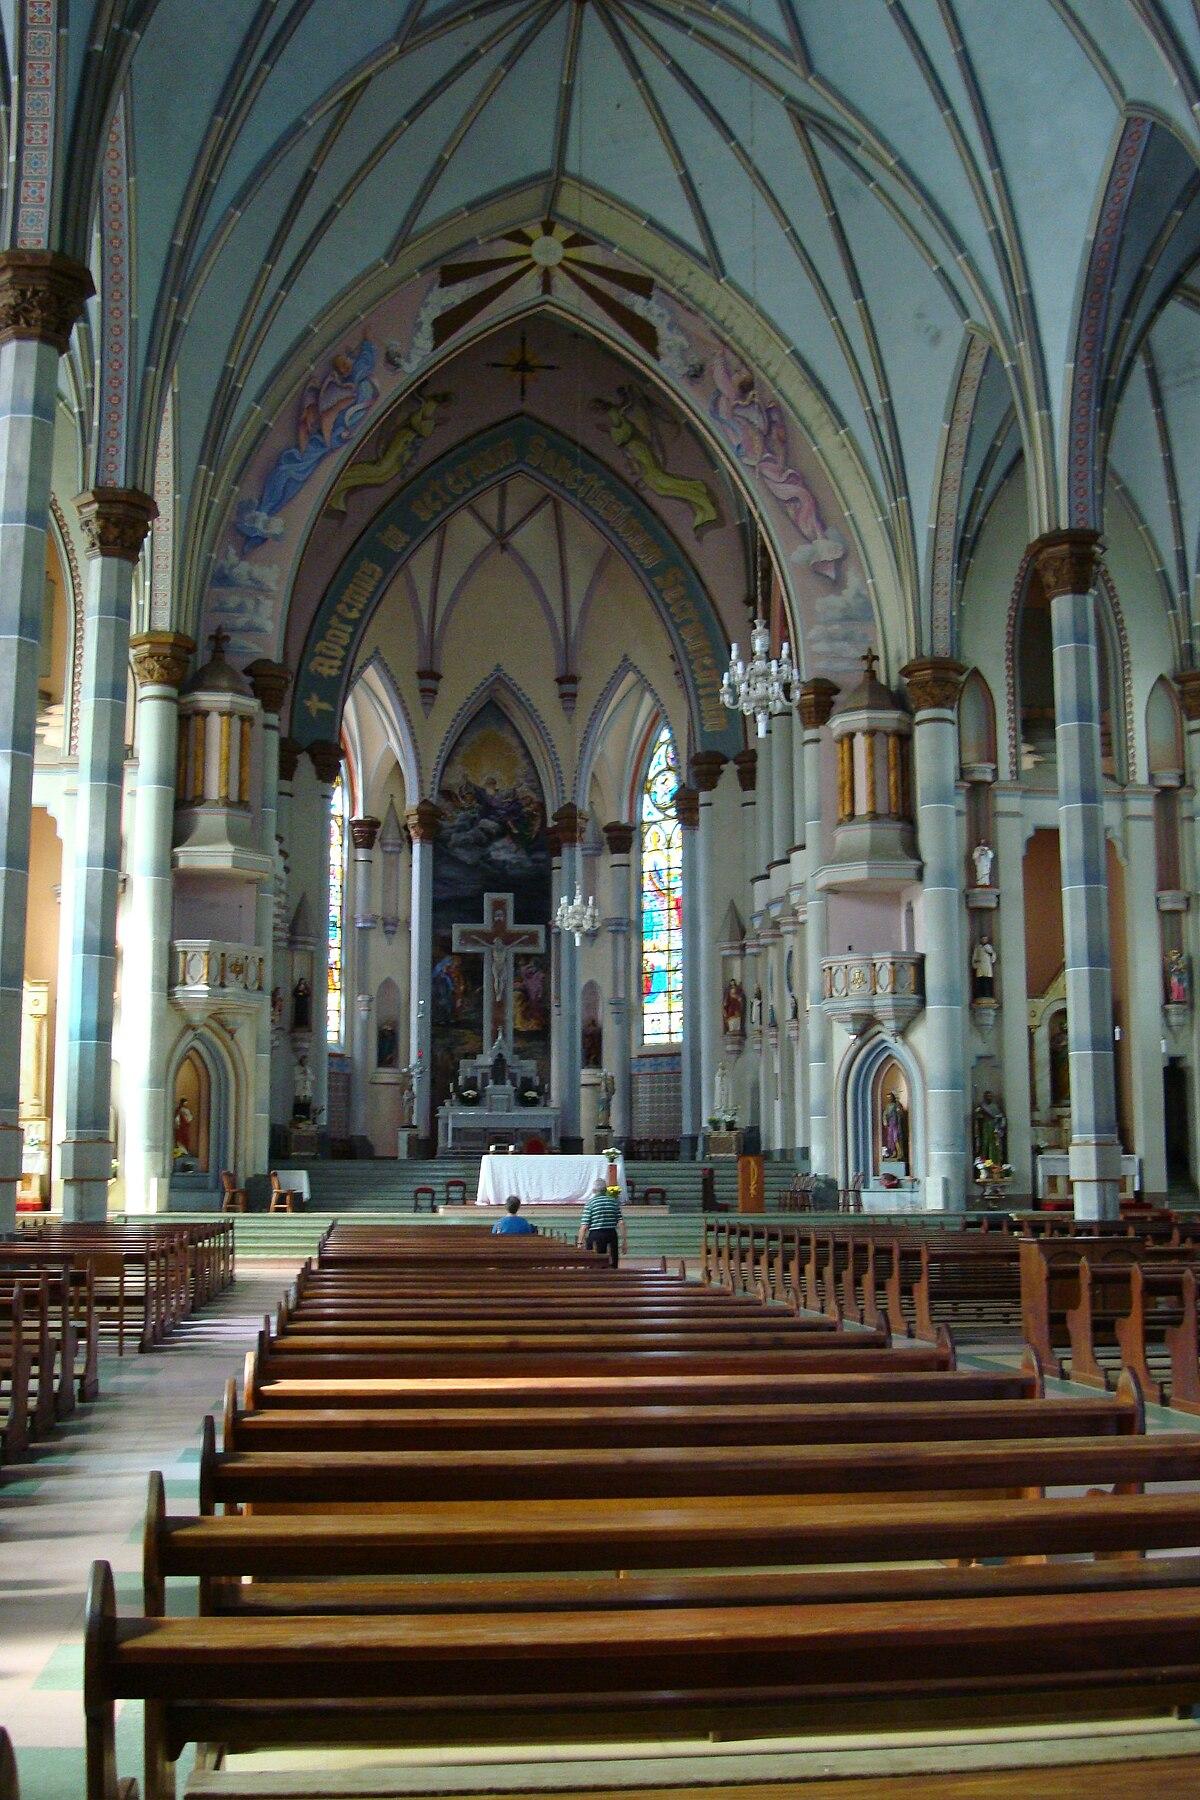 St john the baptist cathedral santa cruz do sul wikipedia for A mobilia santa cruz do sul